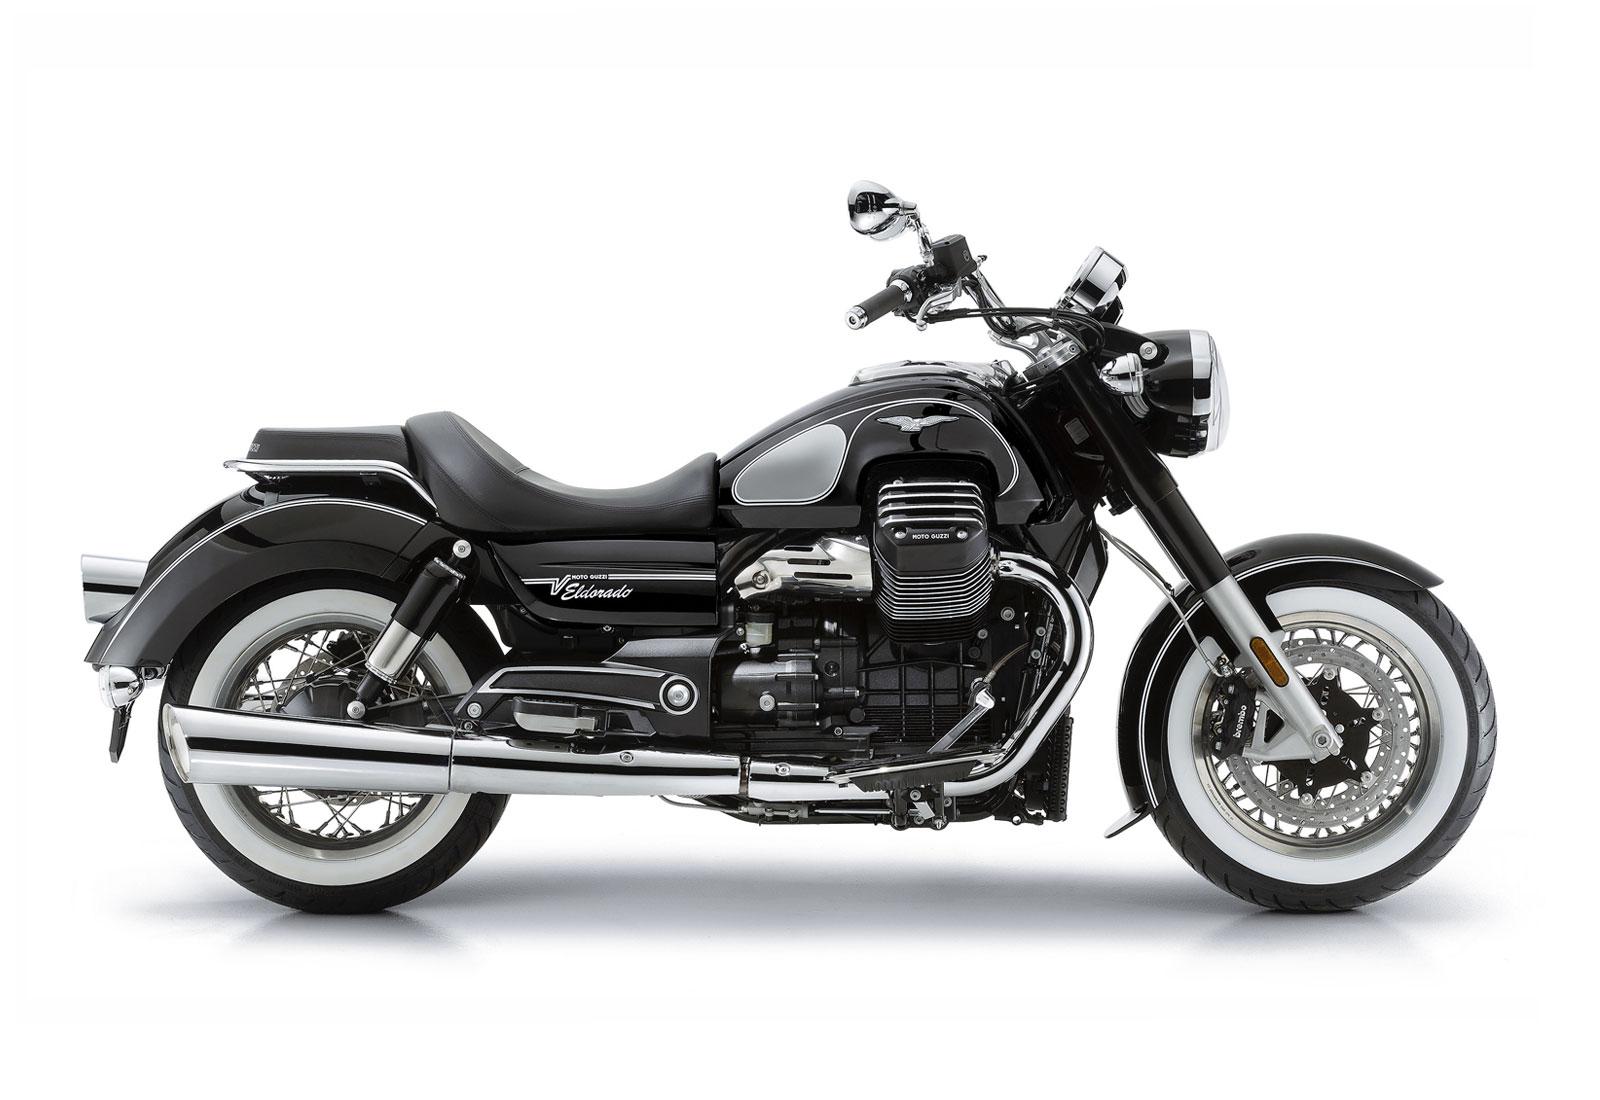 2021 Moto Guzzi Eldorado